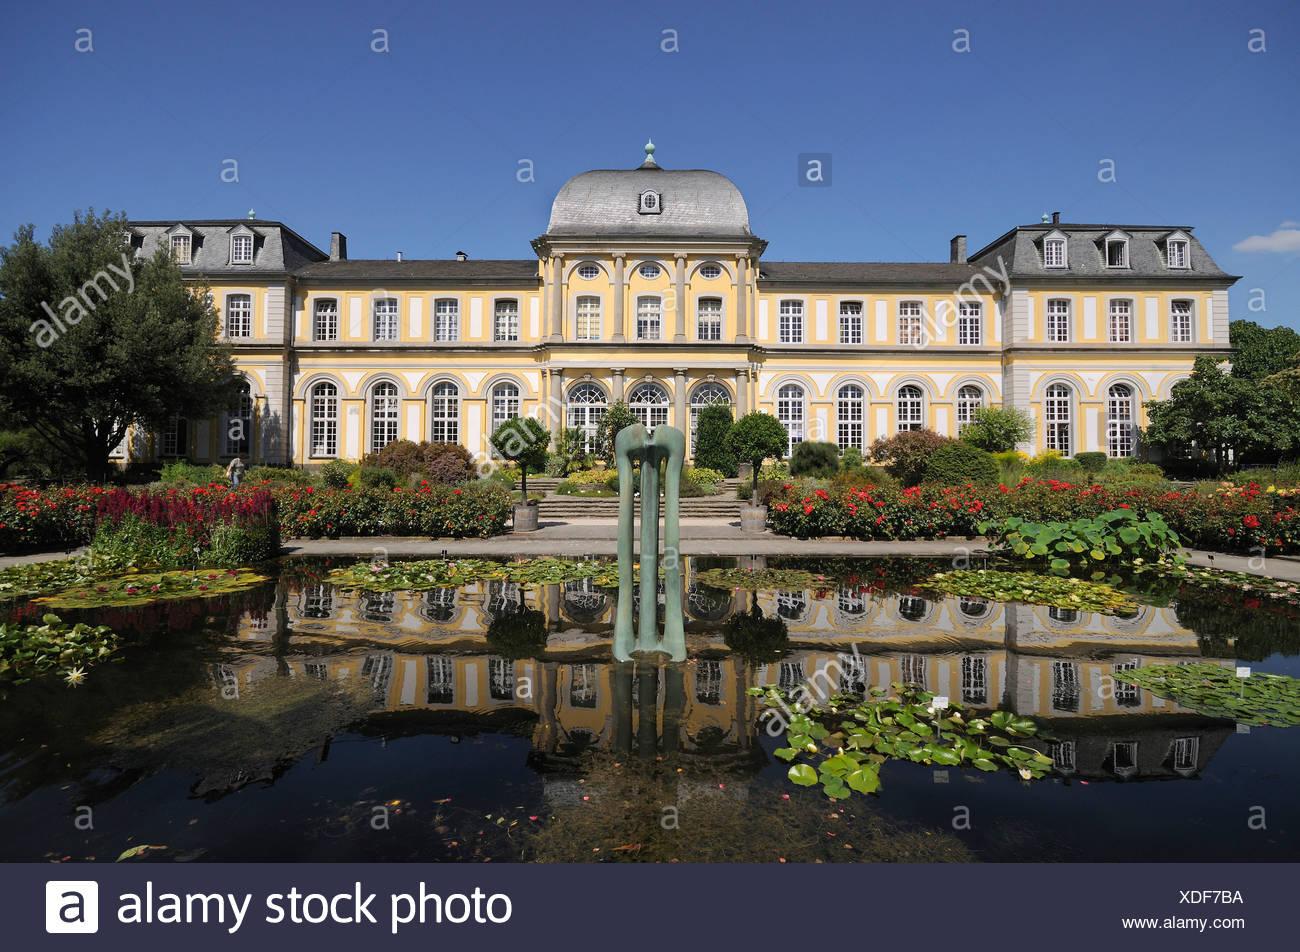 Botanical Garden, Bonn Poppelsdorf, Bonn, North Rhine-Westphalia - Stock Image